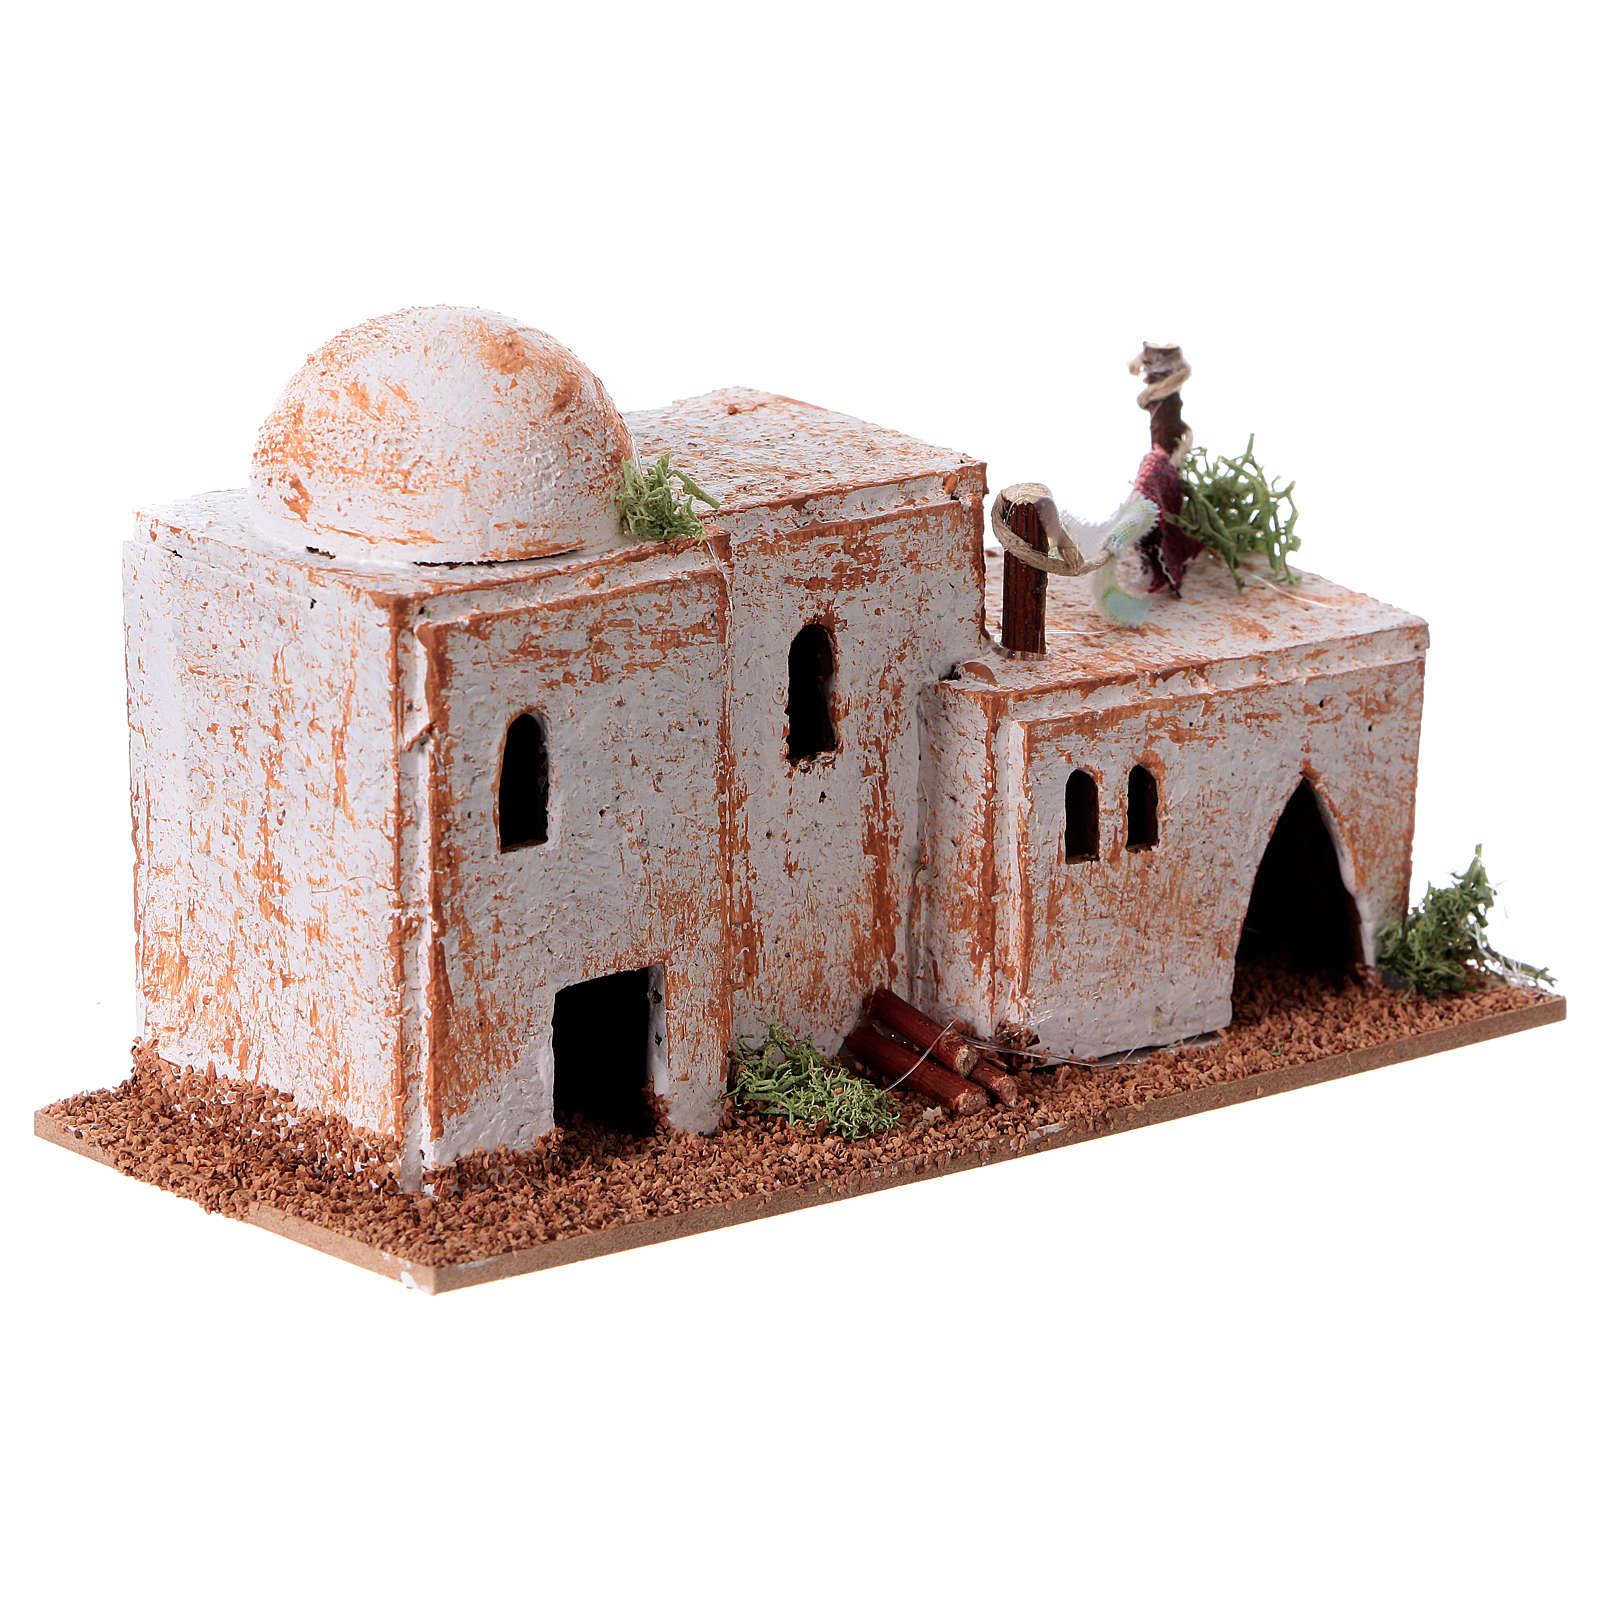 Maison arabe liège 15x7x8 cm 4